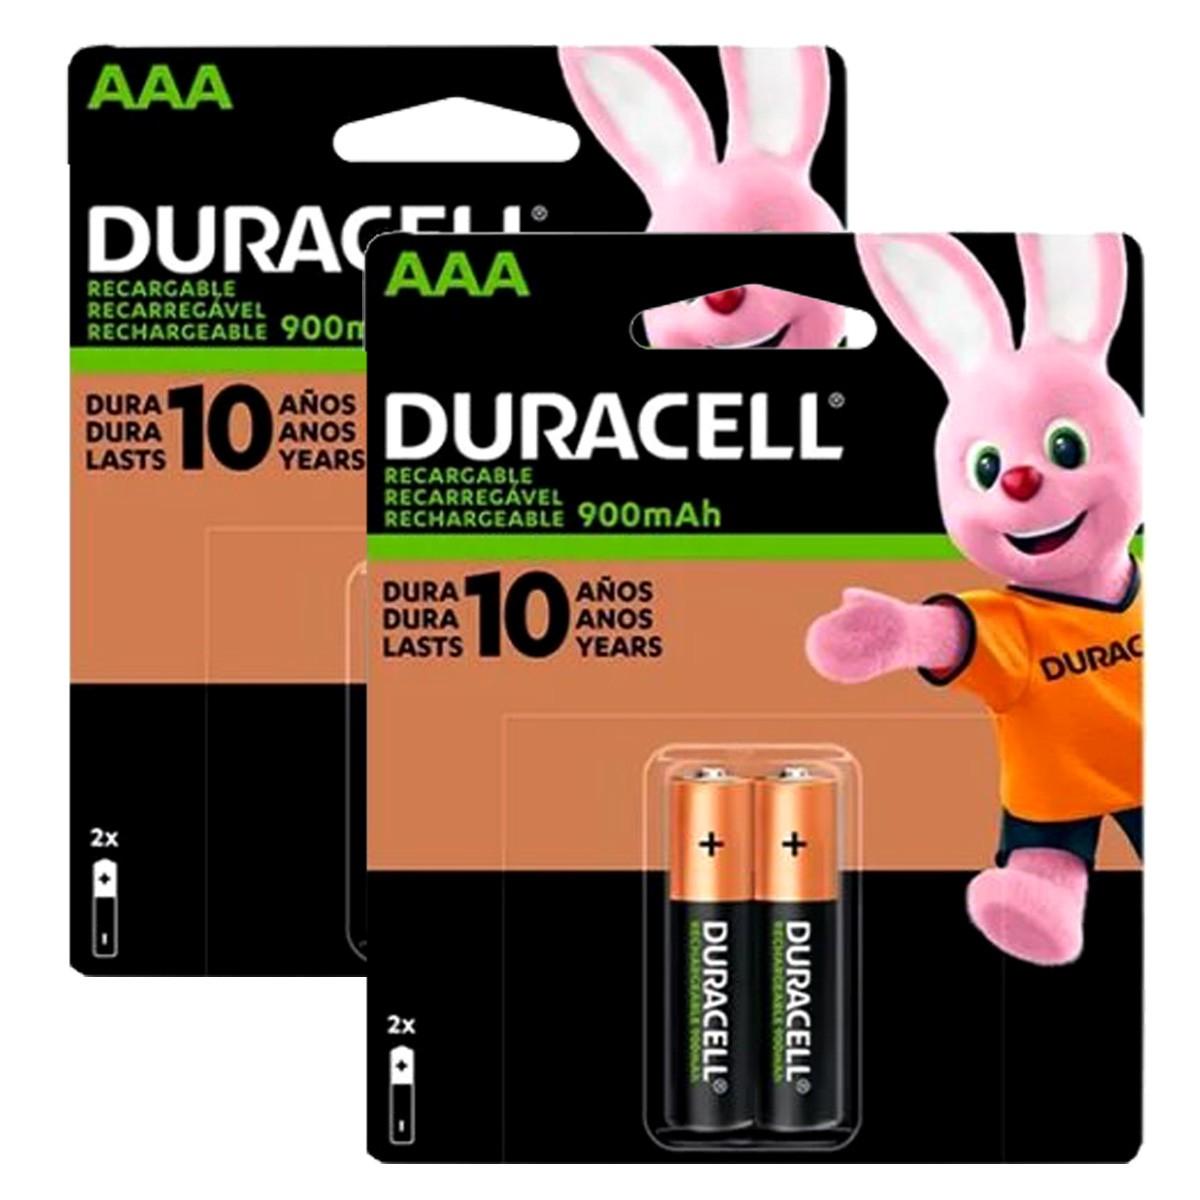 04 Pilhas AAA Recarregável 900mAh DURACELL 2 cartelas